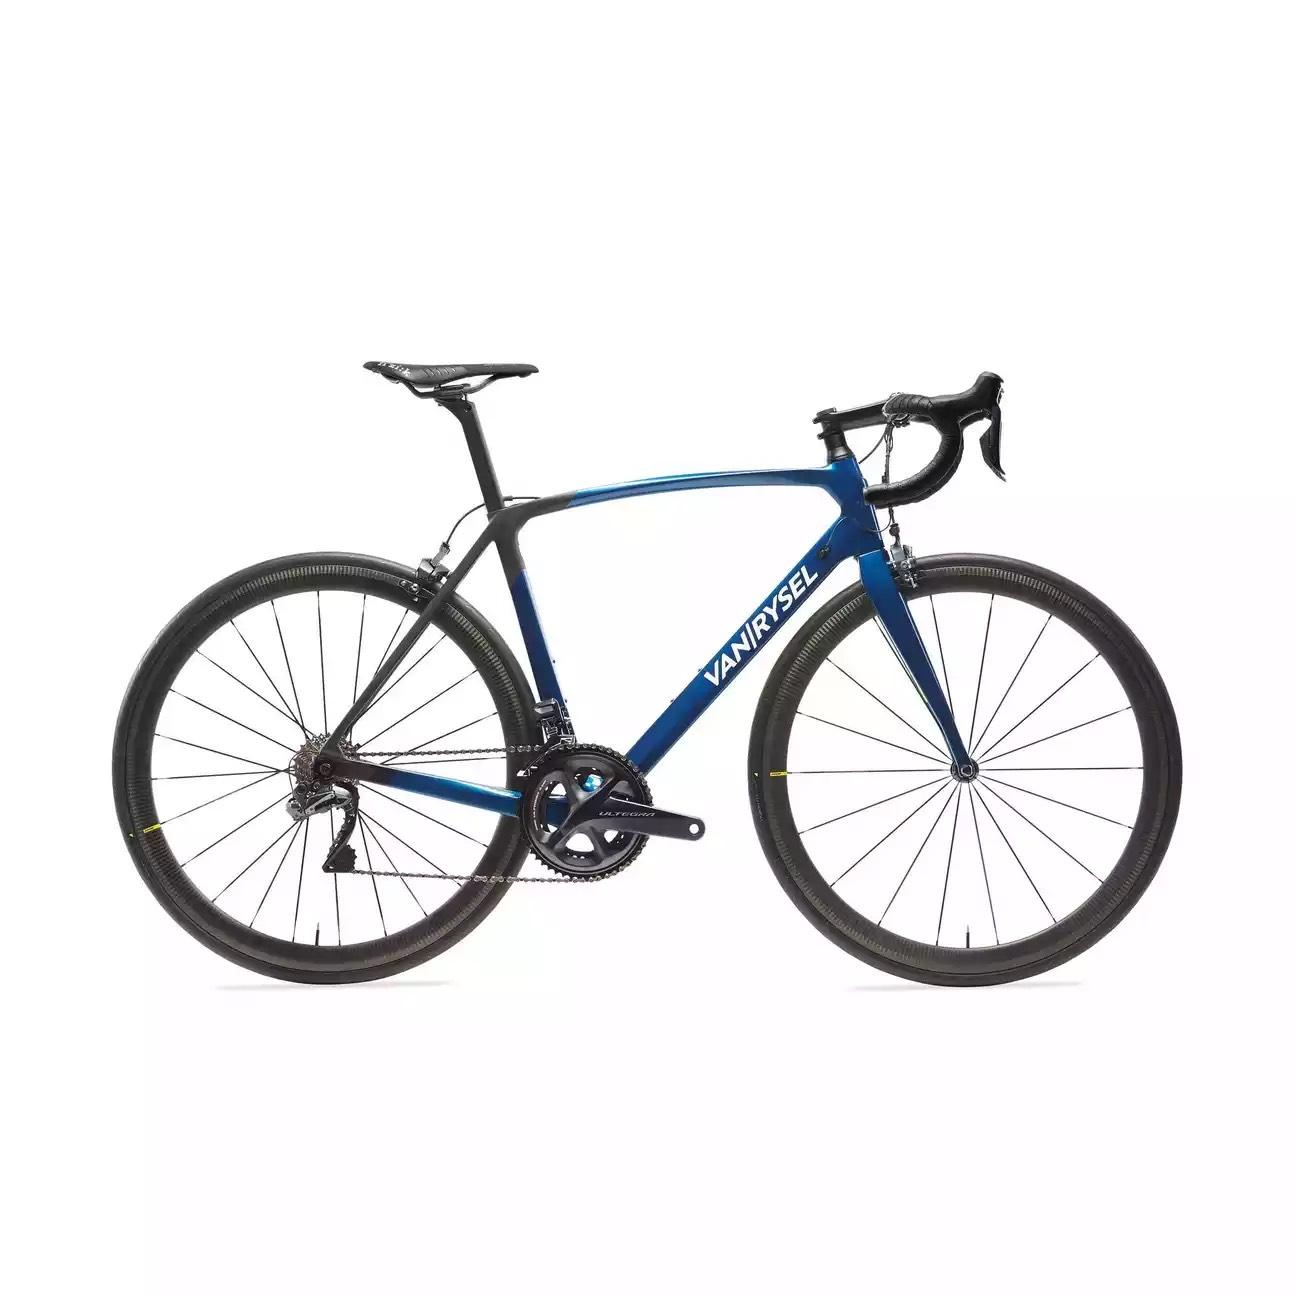 [Decathlon] Van Rysel Rennrad Ultra 940 CF Ultegra Di2